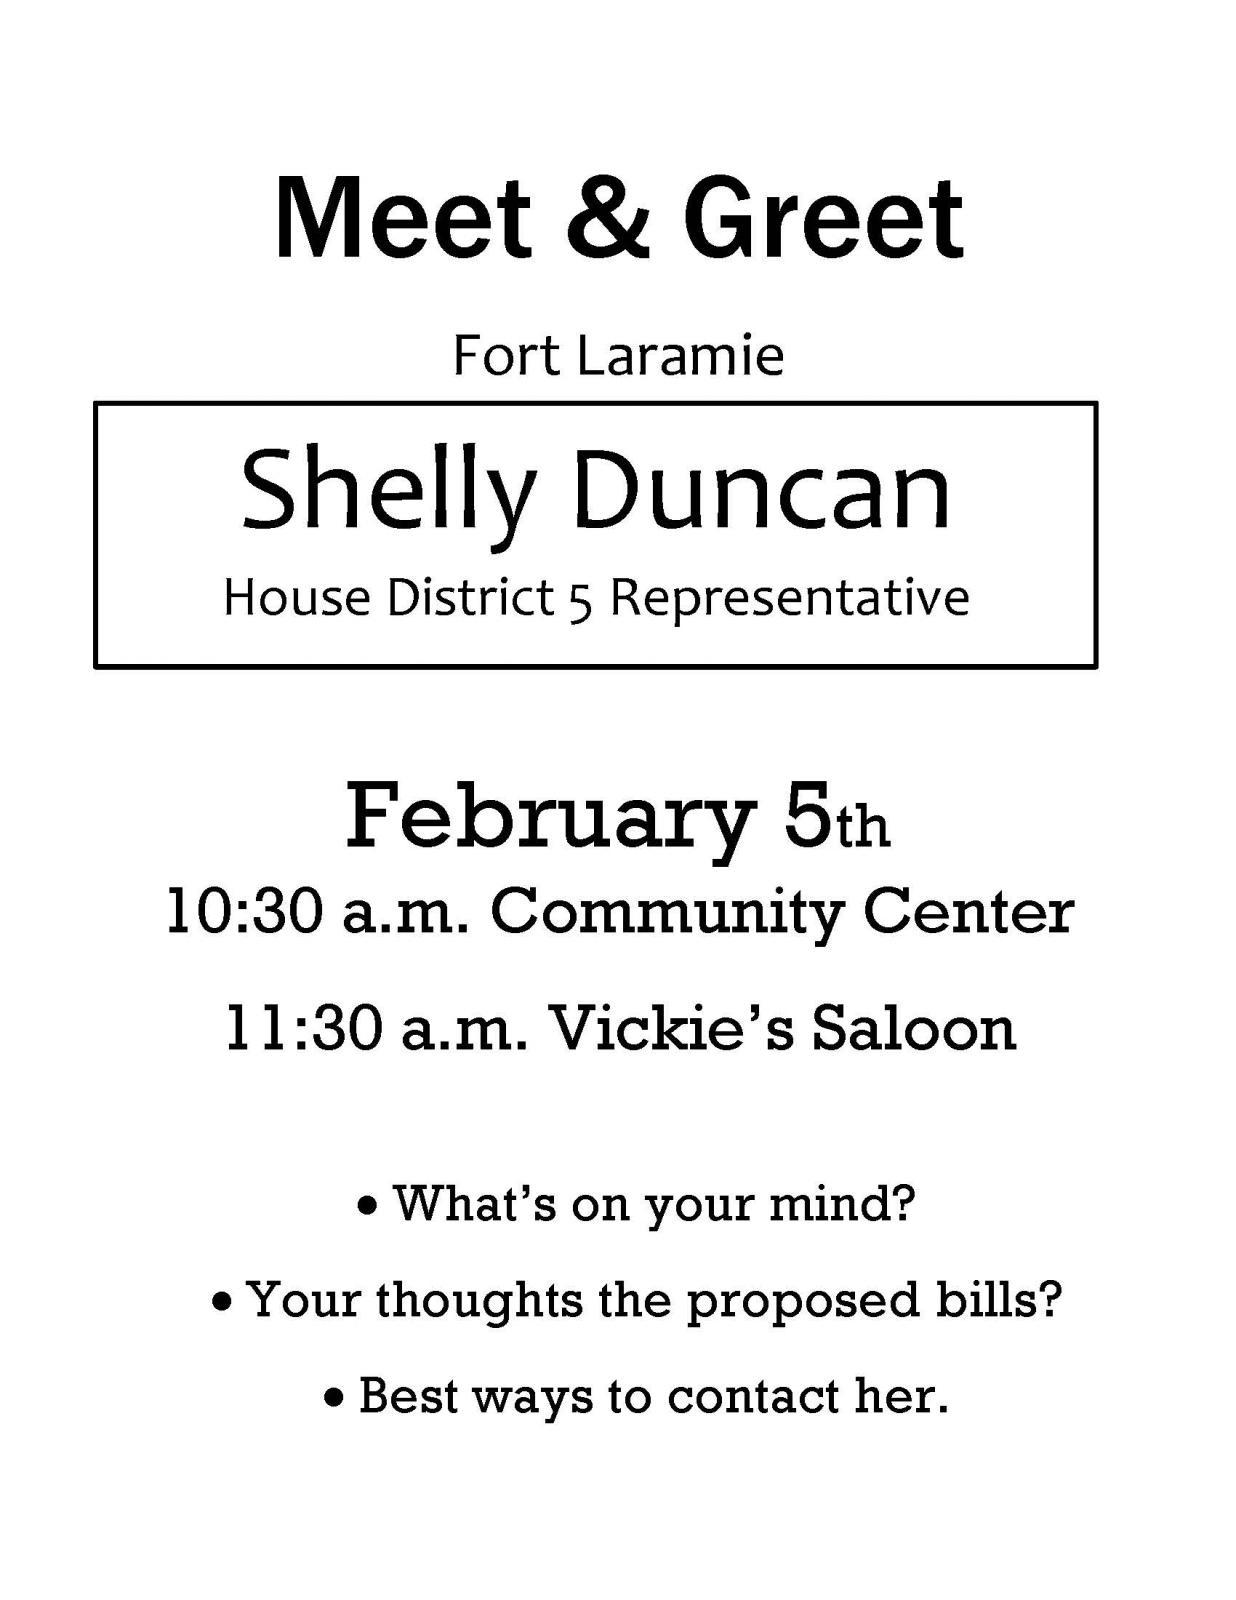 Meet & Greet Shelly Duncan held in Fort Laramie Photo